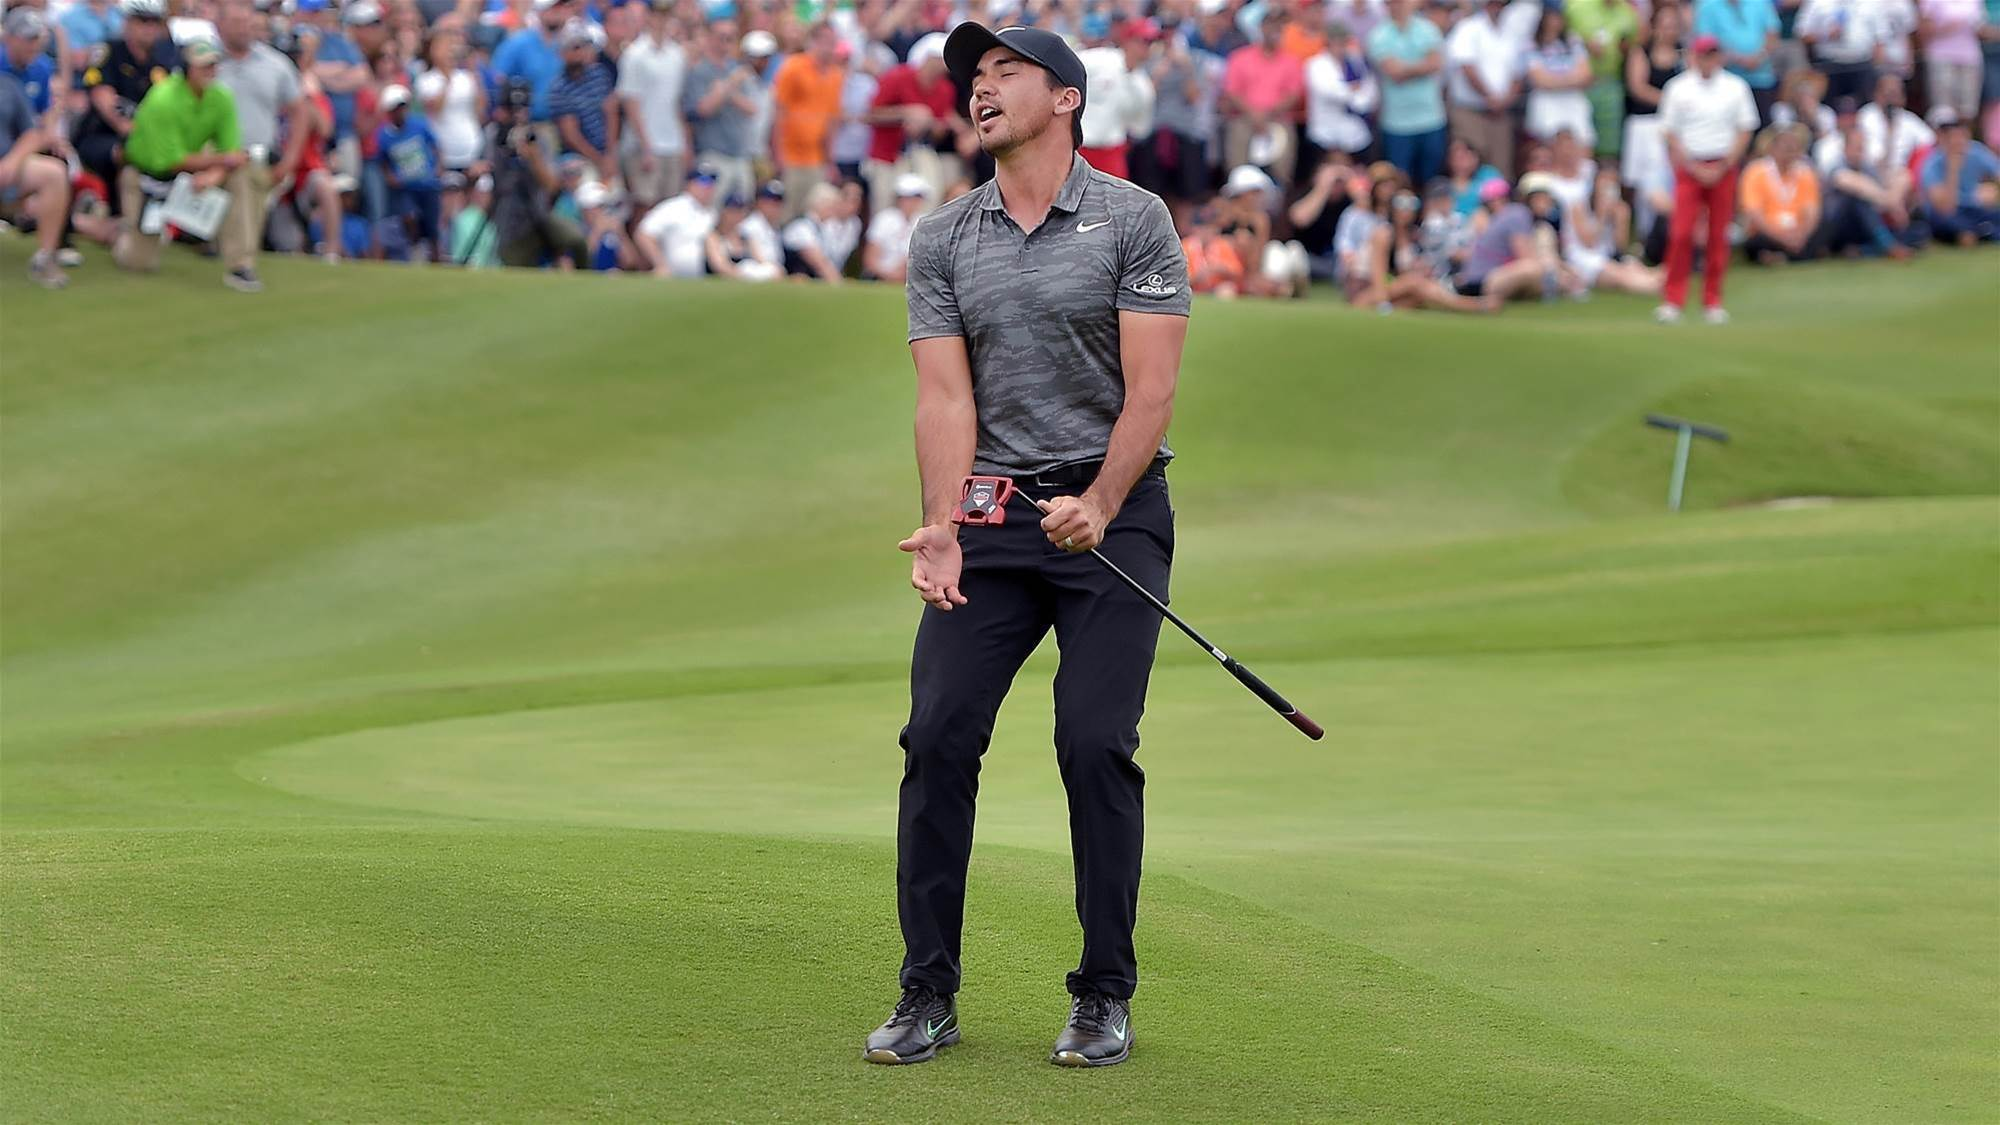 PGA TOUR: Day 'feeling good' despite play-off loss